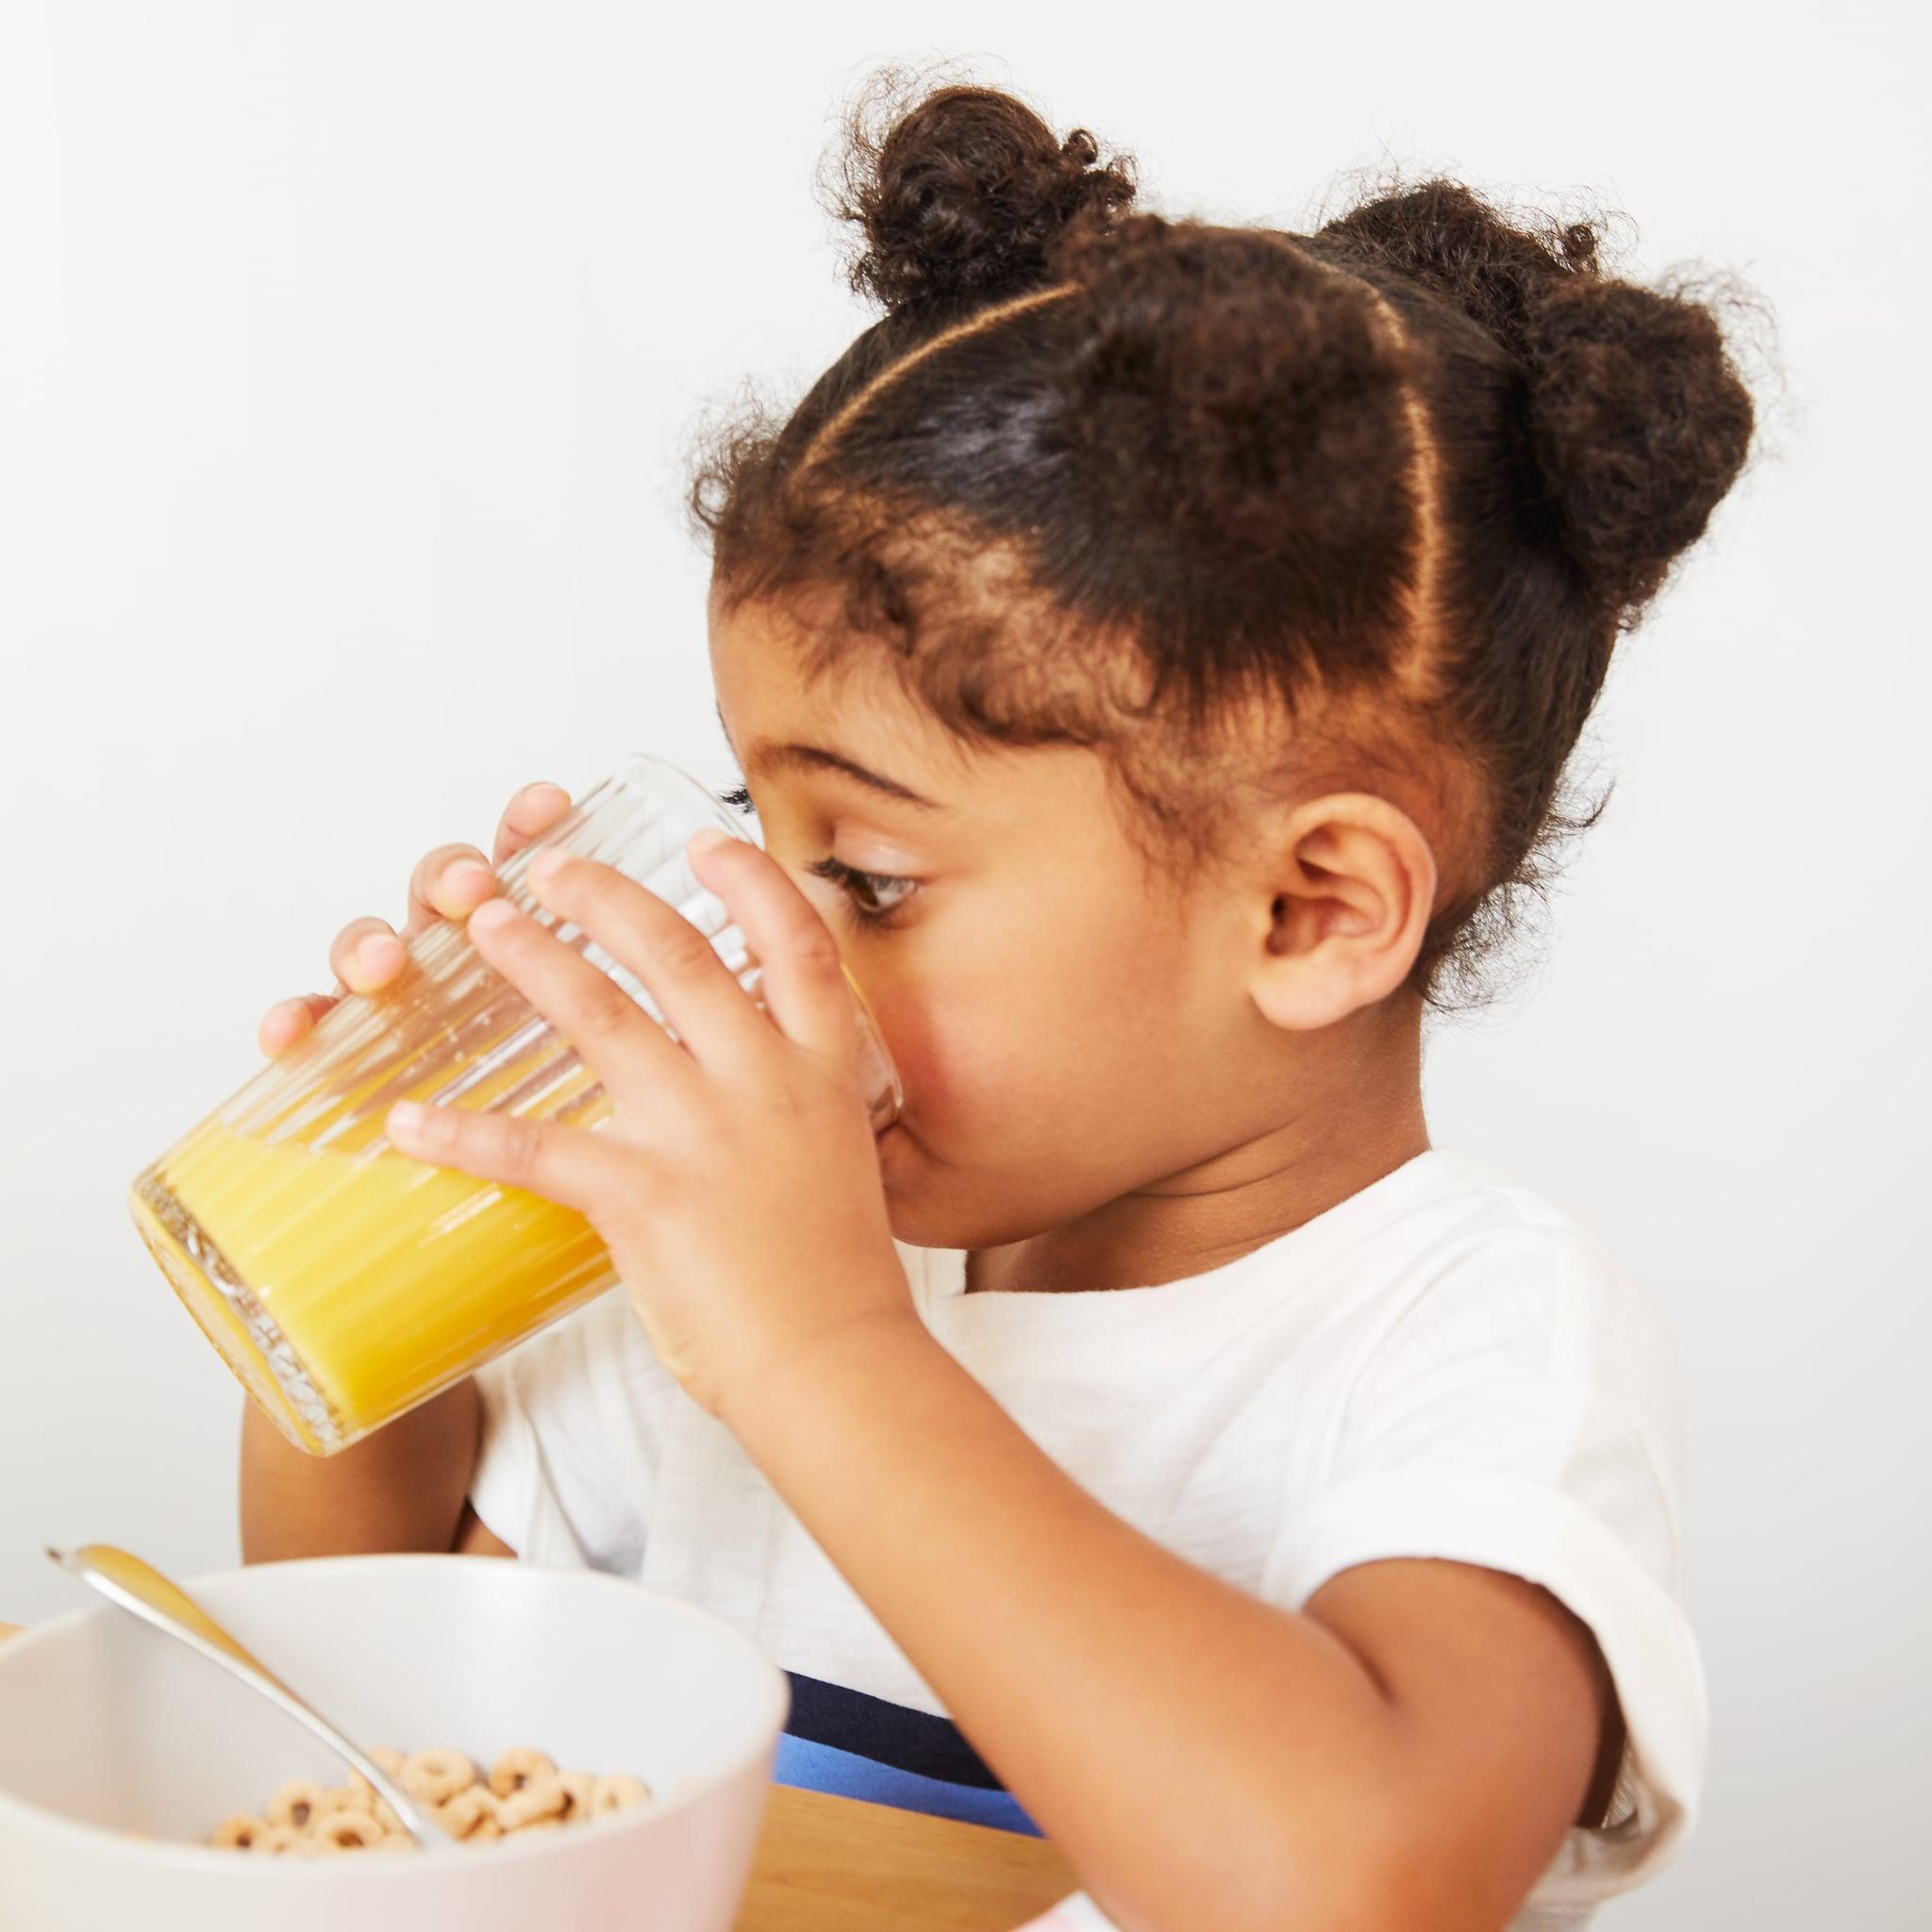 Healthy Habits For Kids Popsugar Family